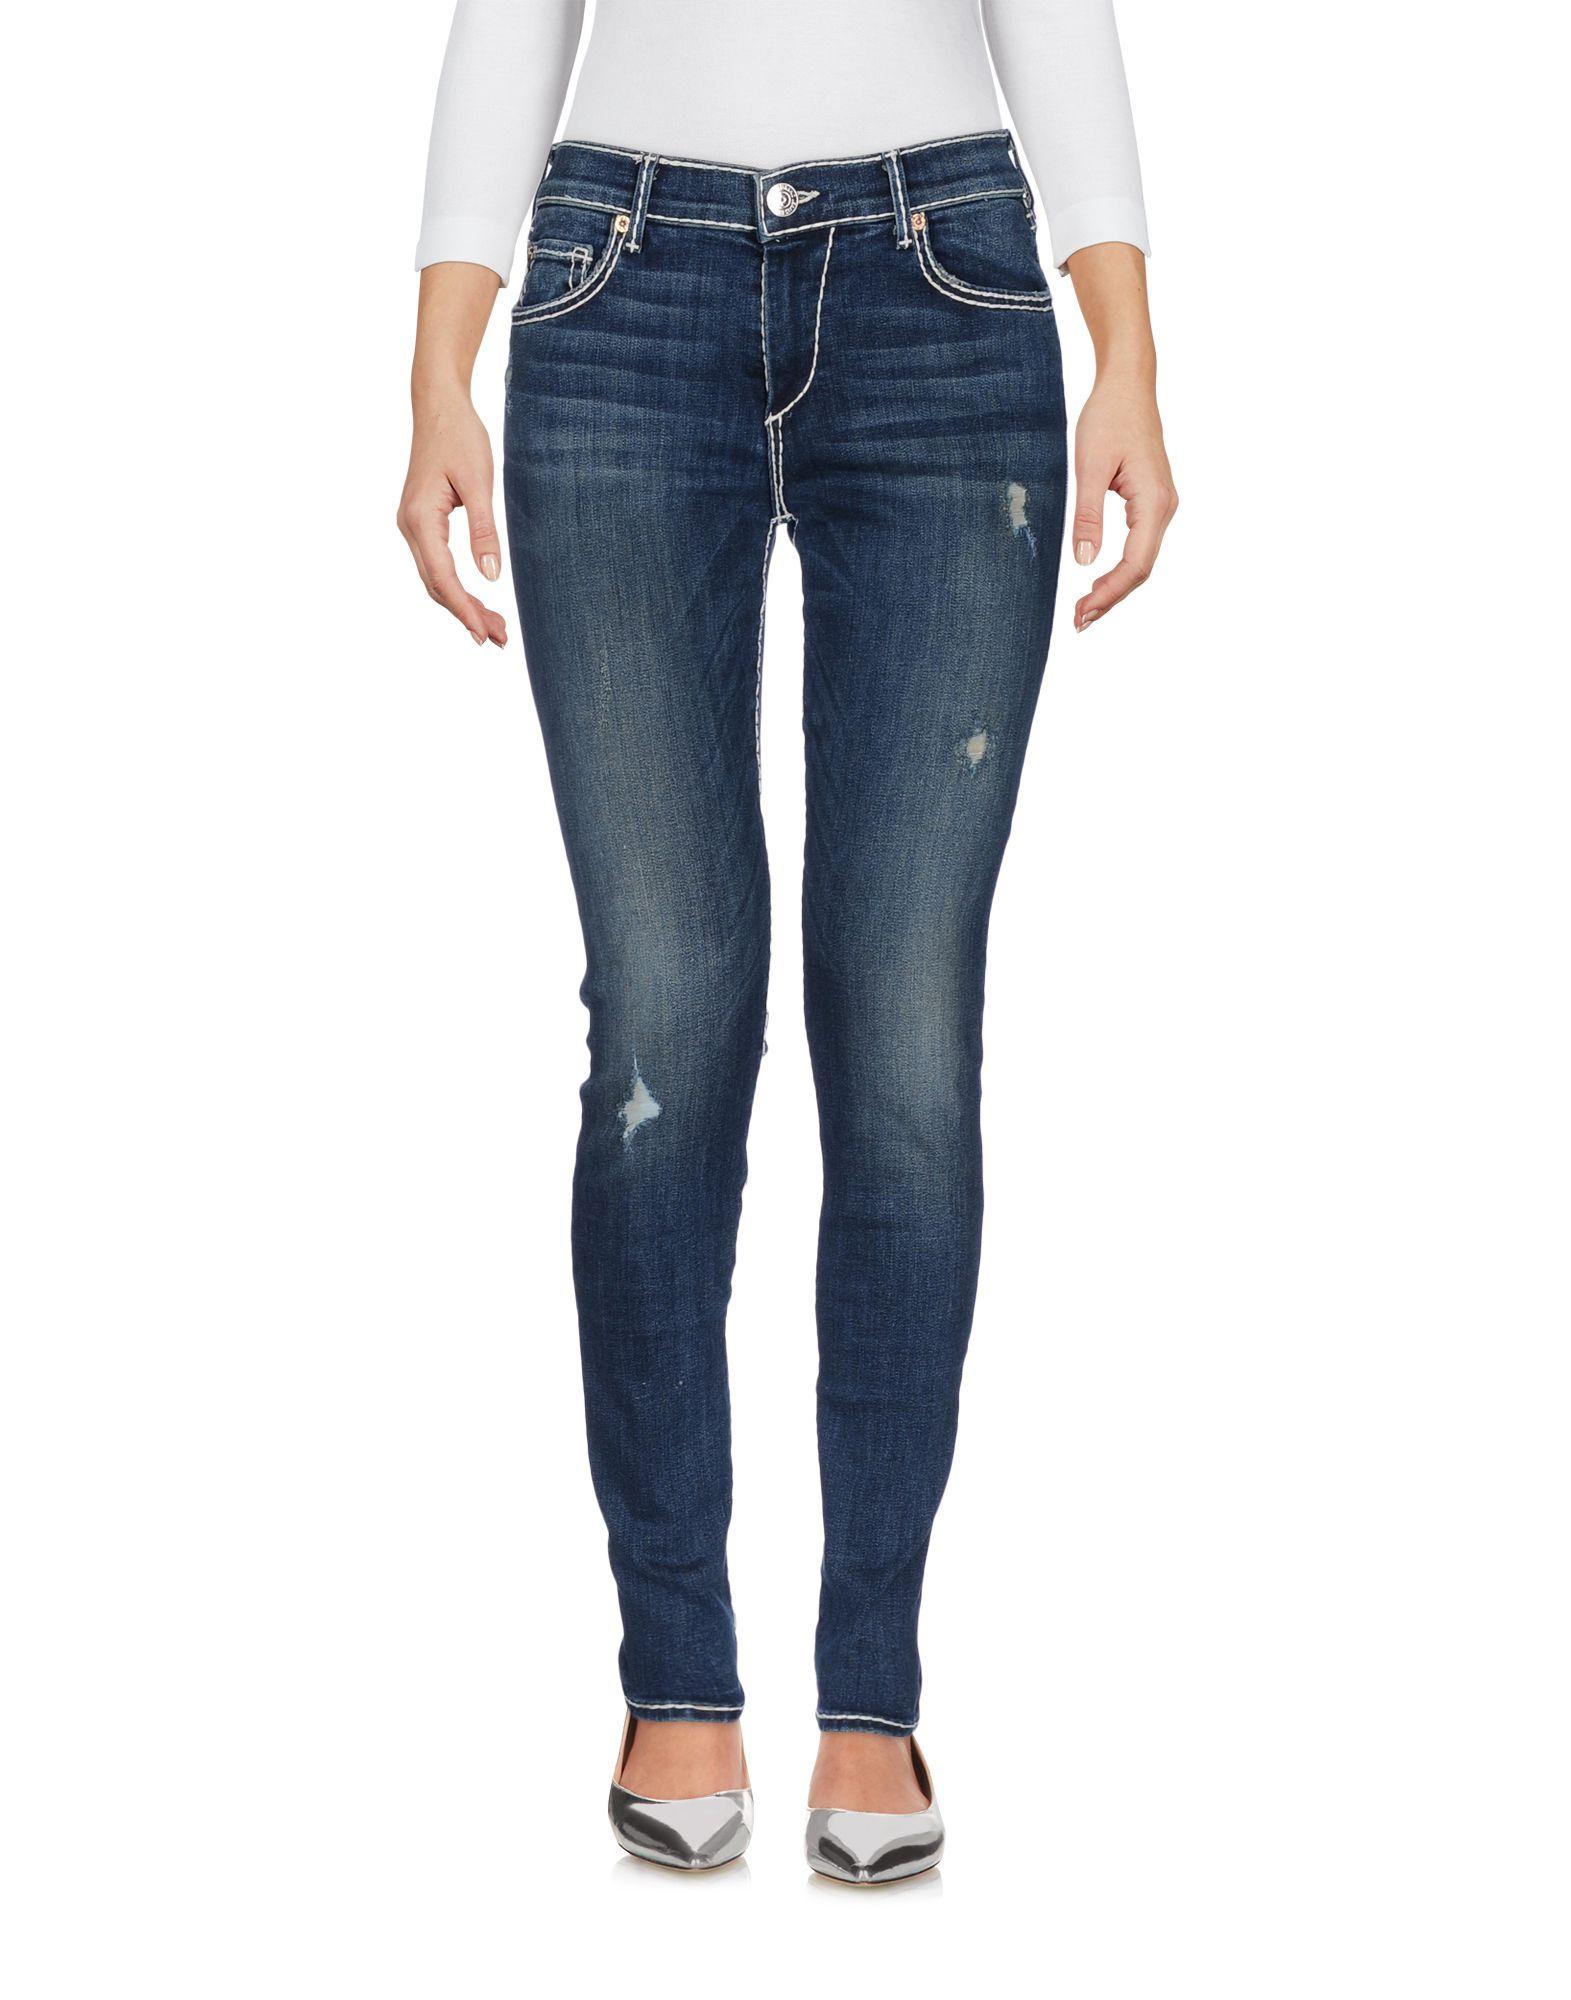 Pantaloni Jeans True Religion Donna - Acquista online su YOOX - 42622607KS